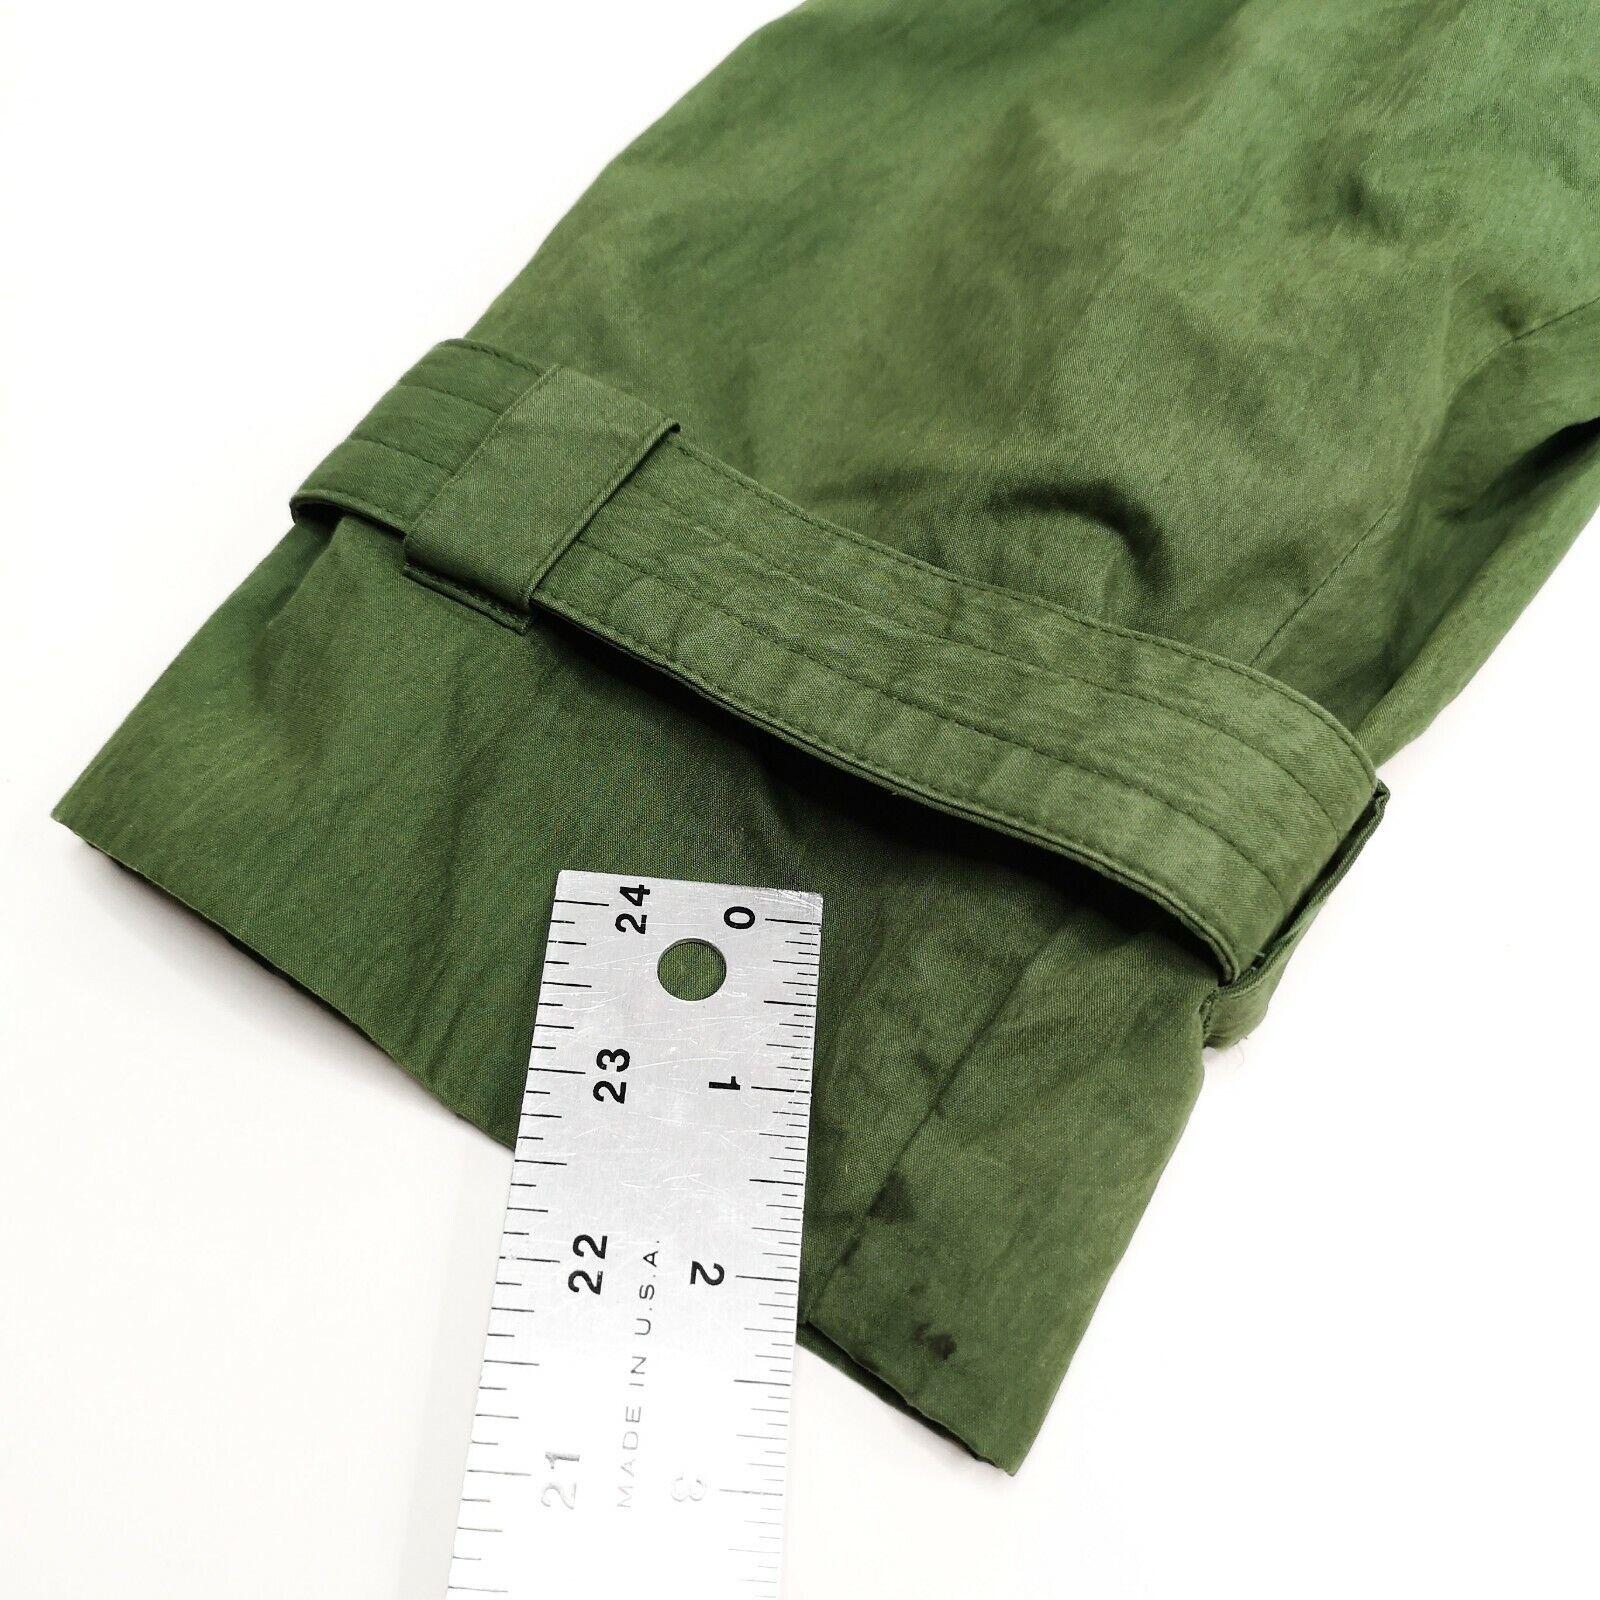 MISTY HARBOR Trench Coat Jacket 8 Olive Green - image 7